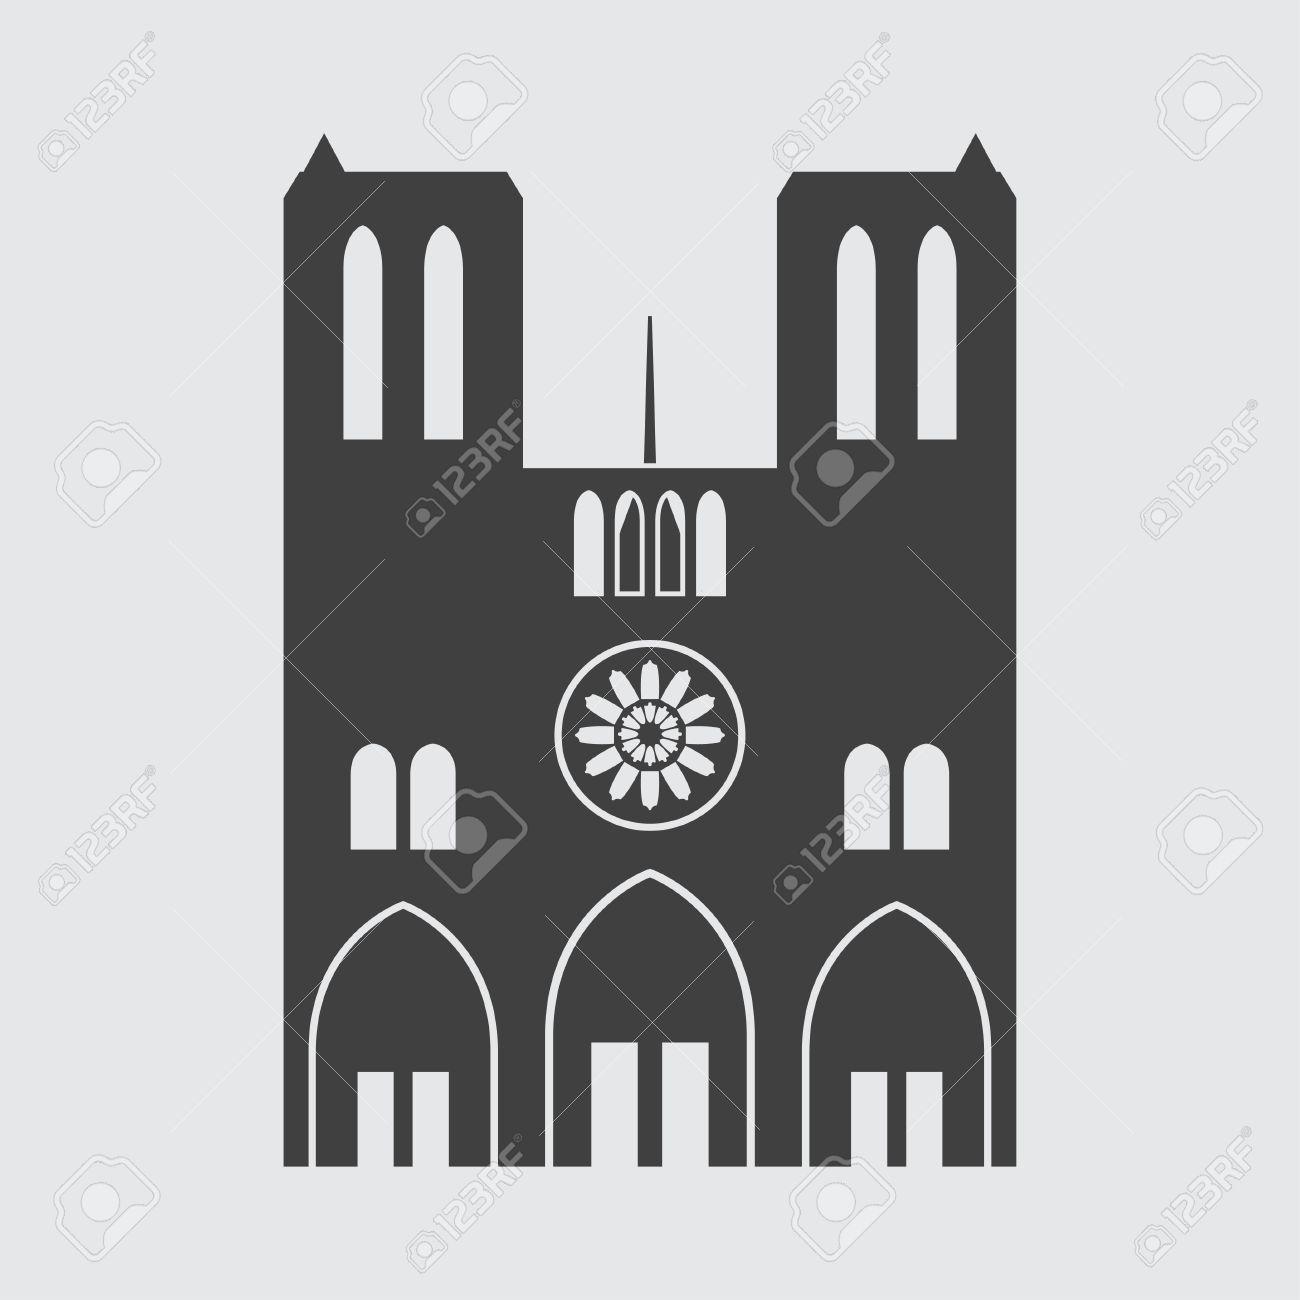 Notre dame de paris icon illustration isolated vector sign symbol notre dame de paris icon illustration isolated vector sign symbol stock vector 63572769 biocorpaavc